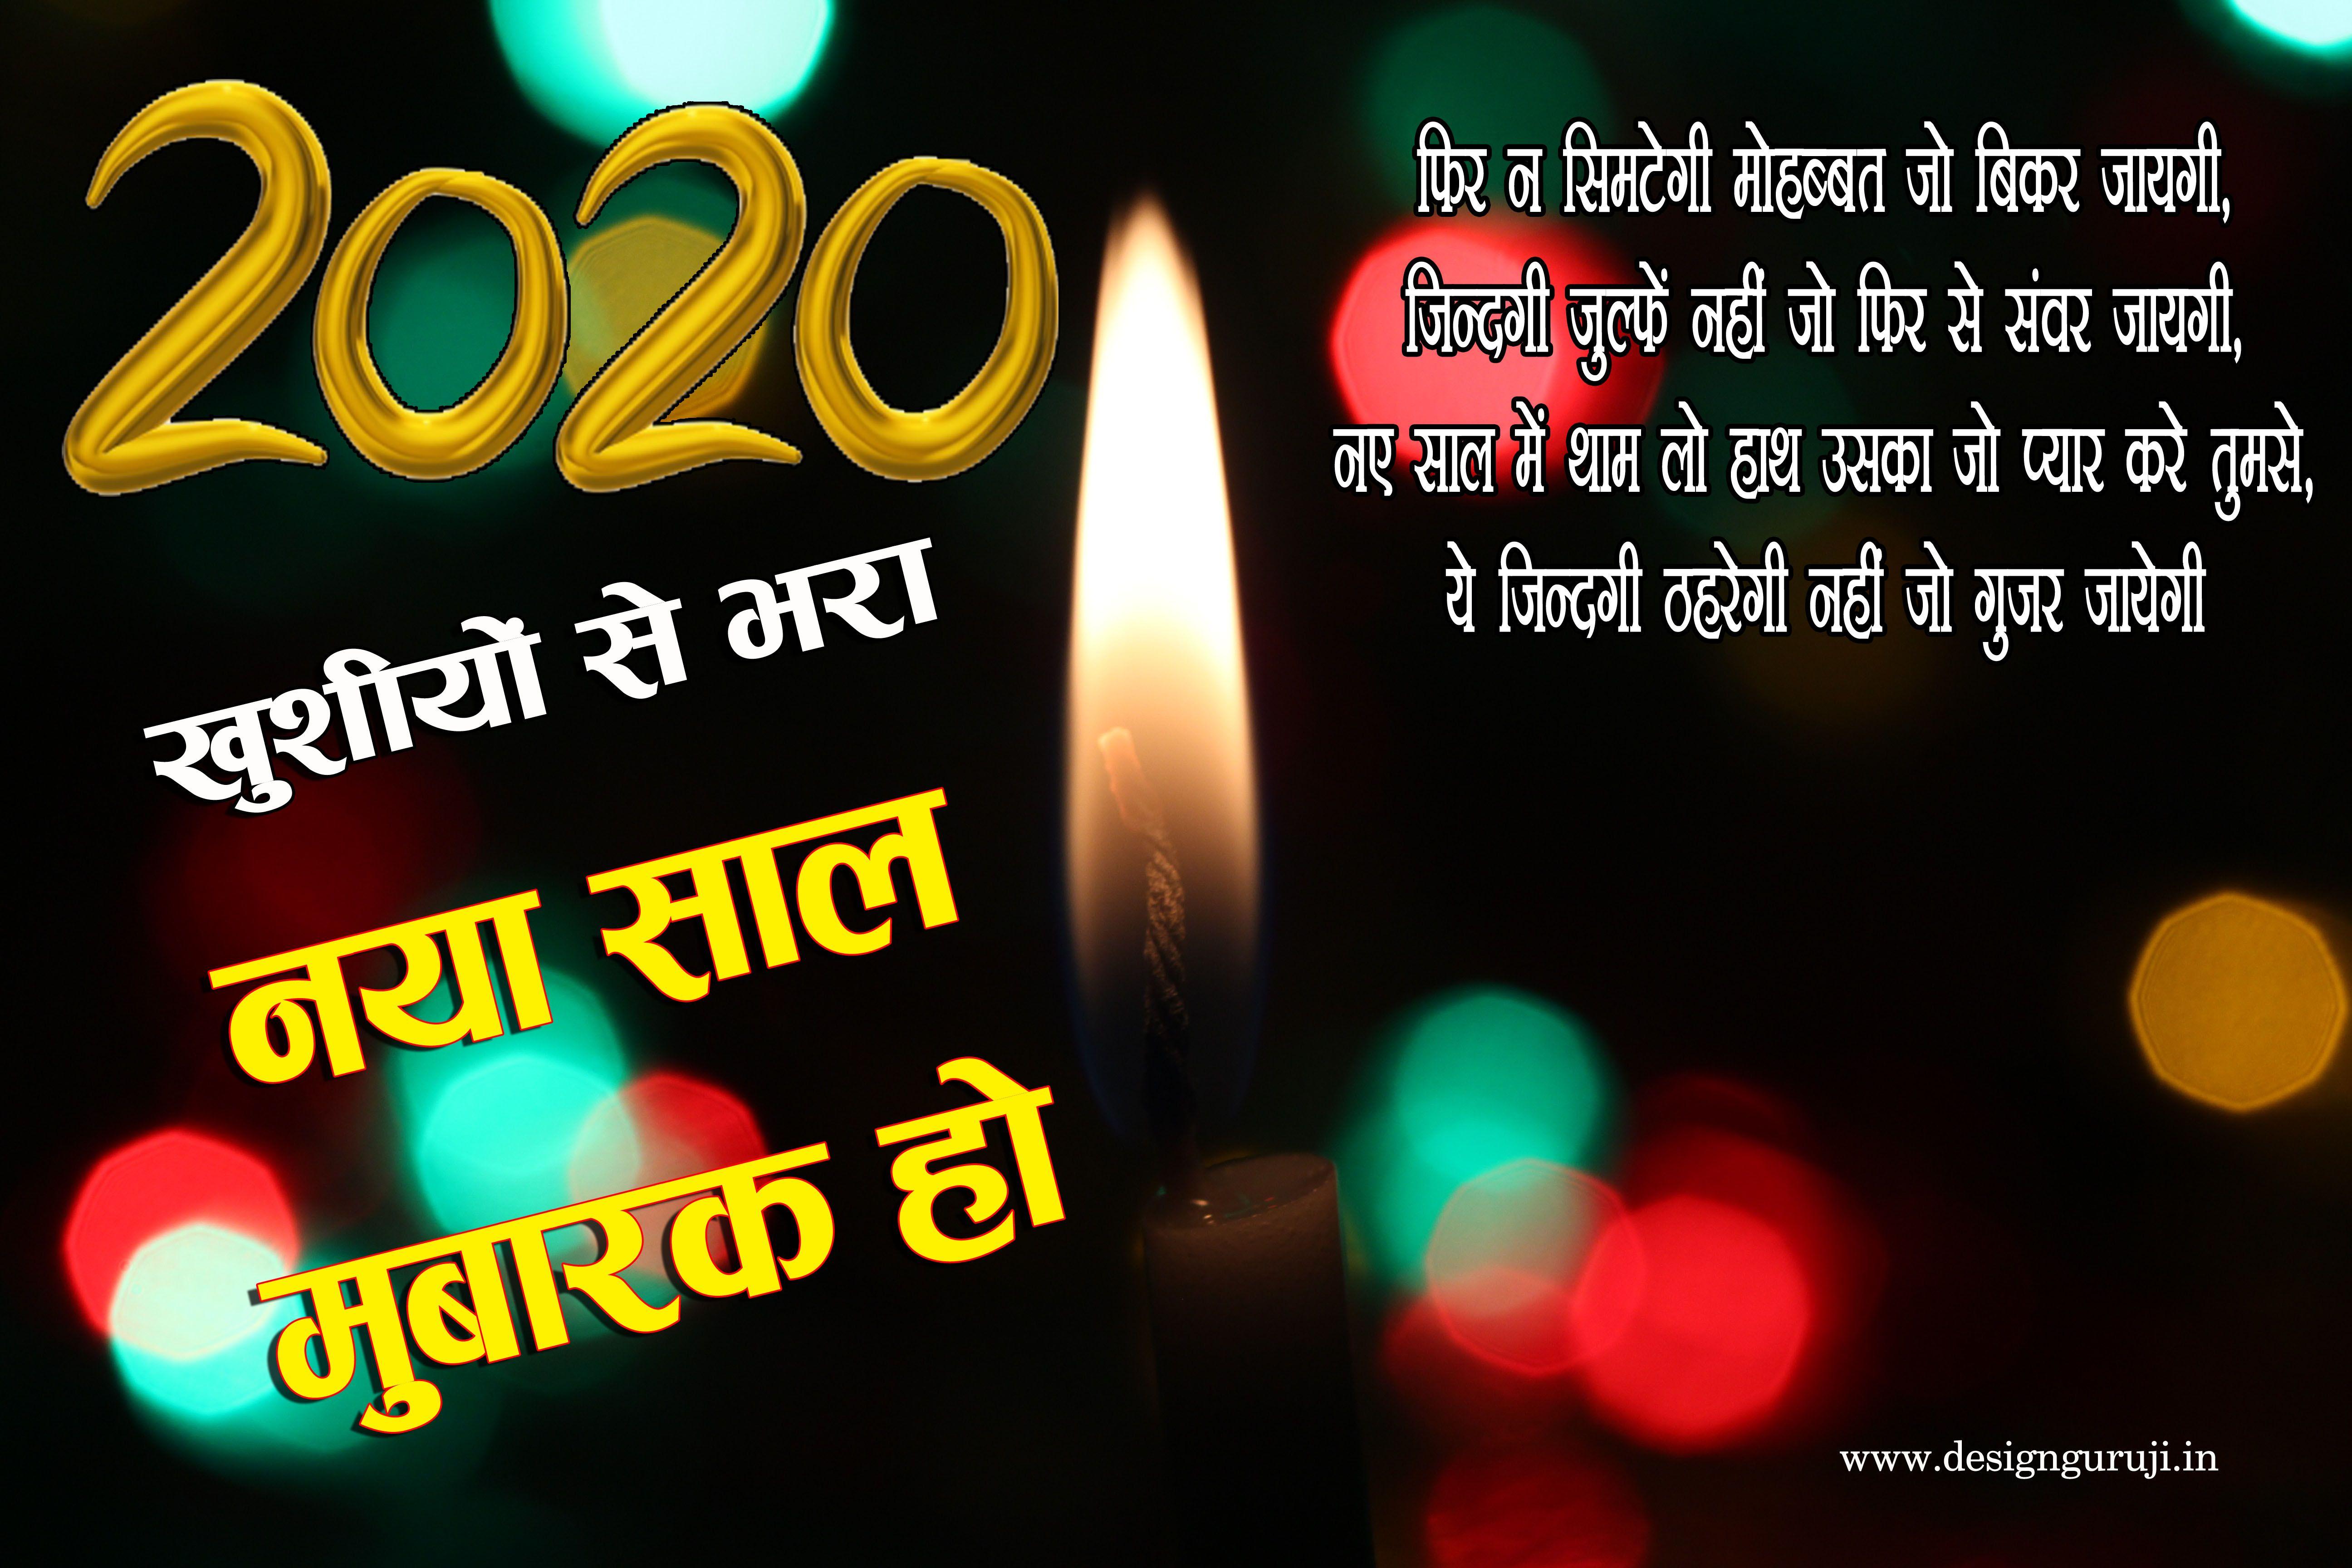 50 Hindi New Year Wishes New Year Wishes Hindi New Year Happy New Year Wishes